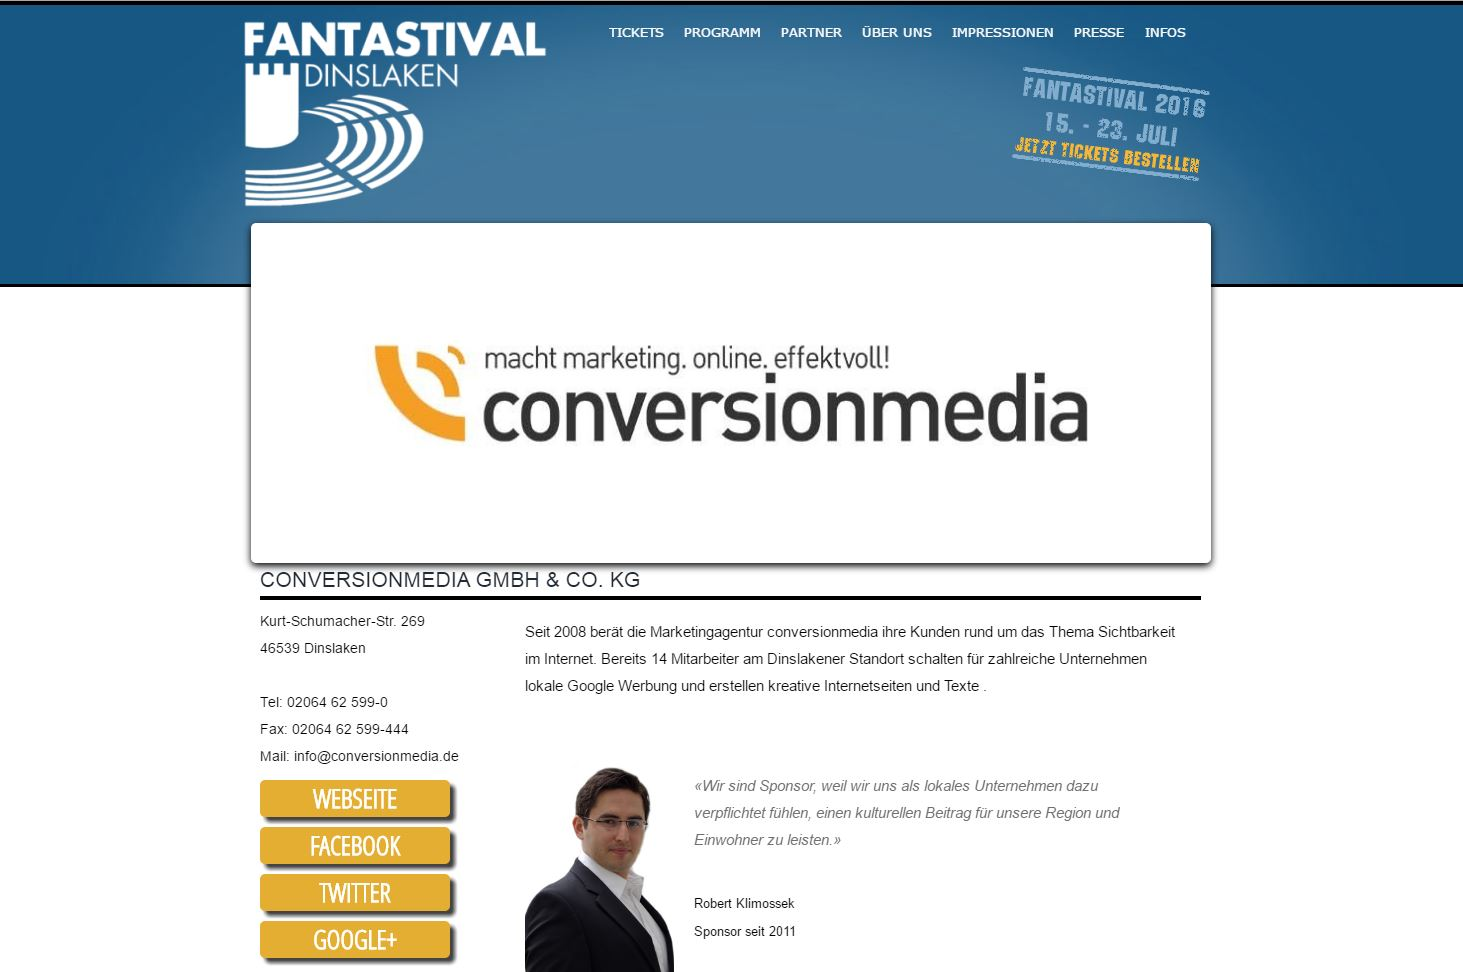 conversionmedia ist Sponsor des Fantastival